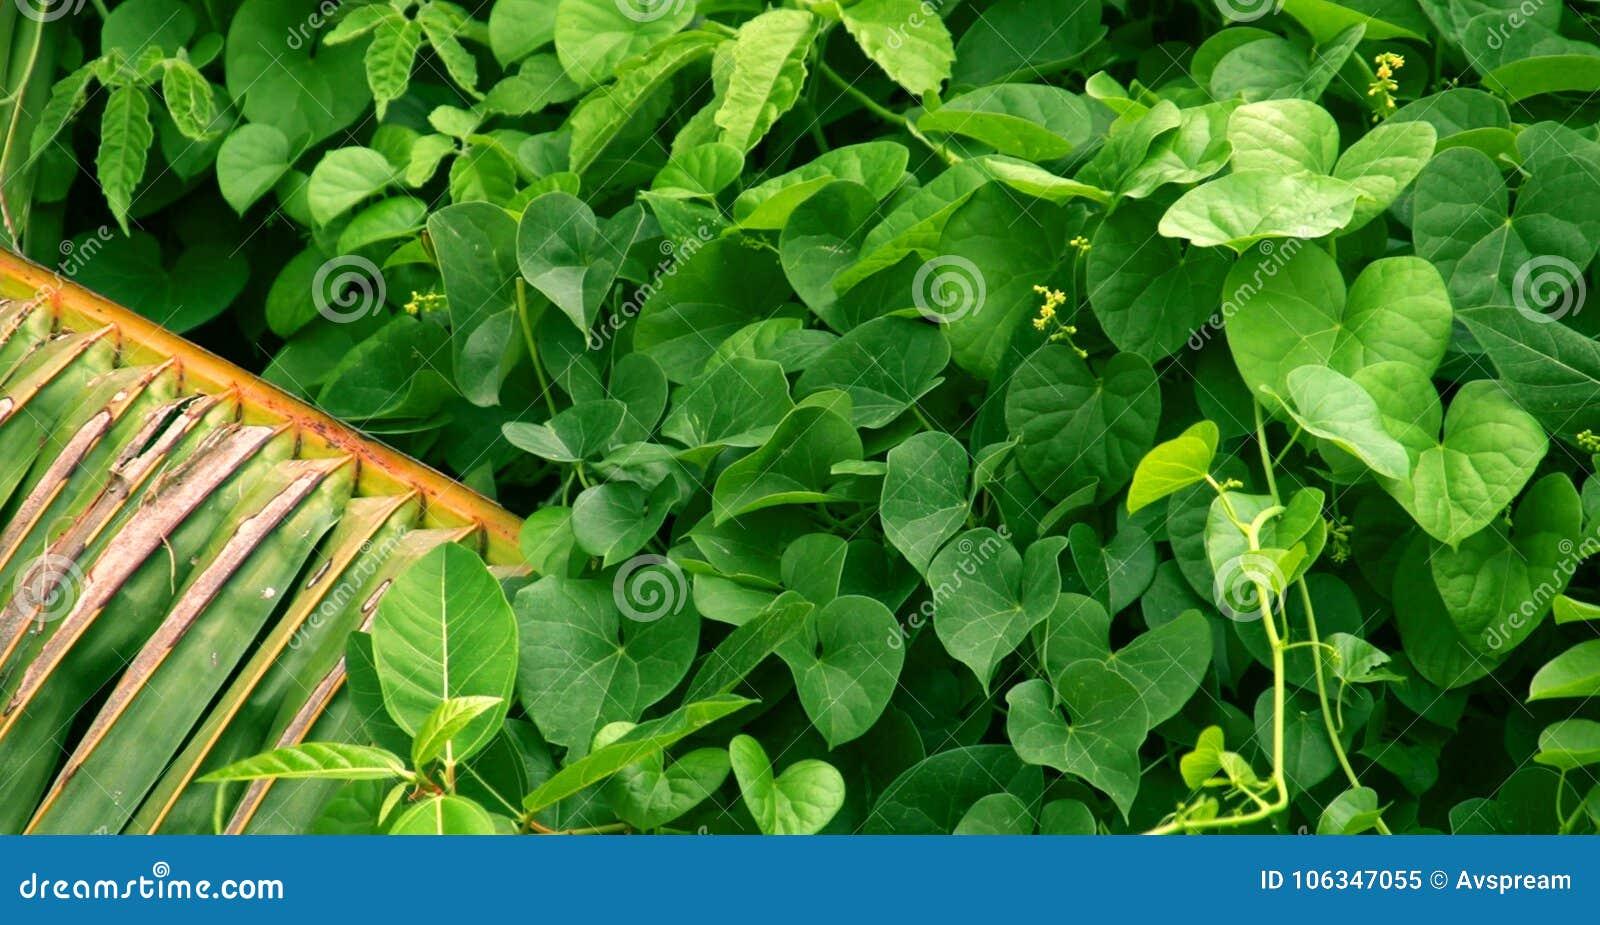 Green leaf, Green Leaves background, palm tree